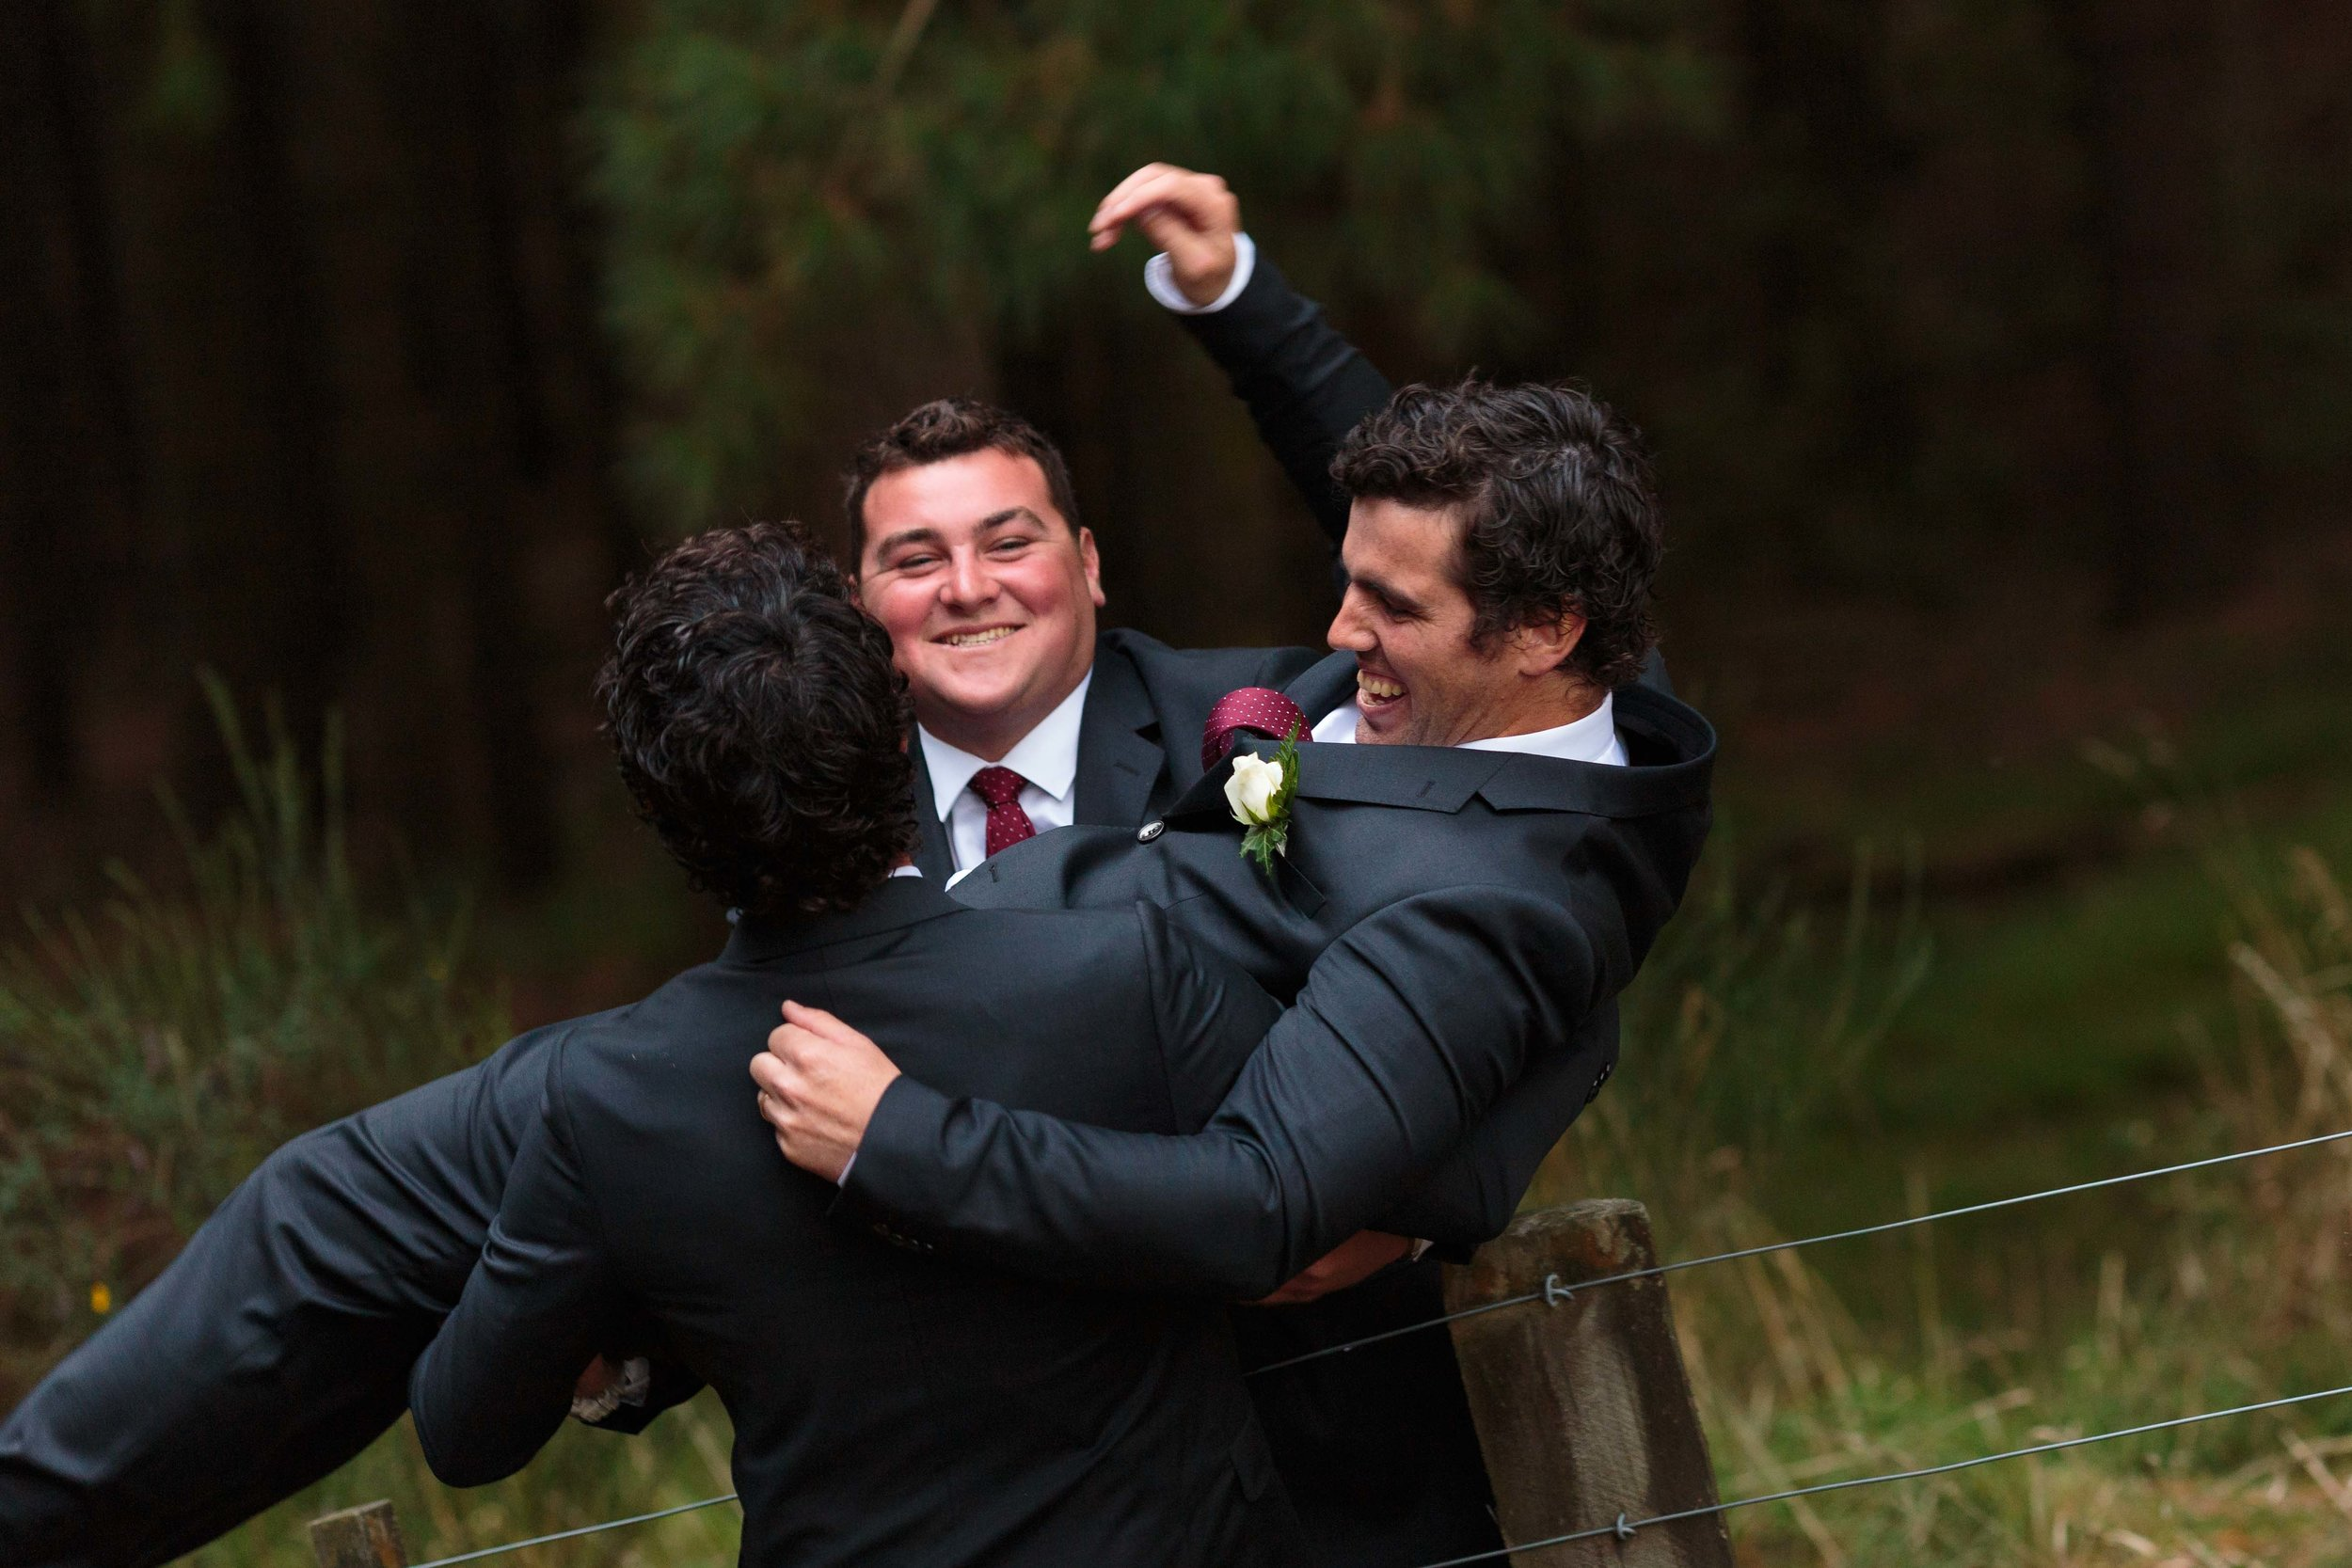 Highight-wedding-photography-dudding-lake-palmerston-north-new-zealand-71.jpg